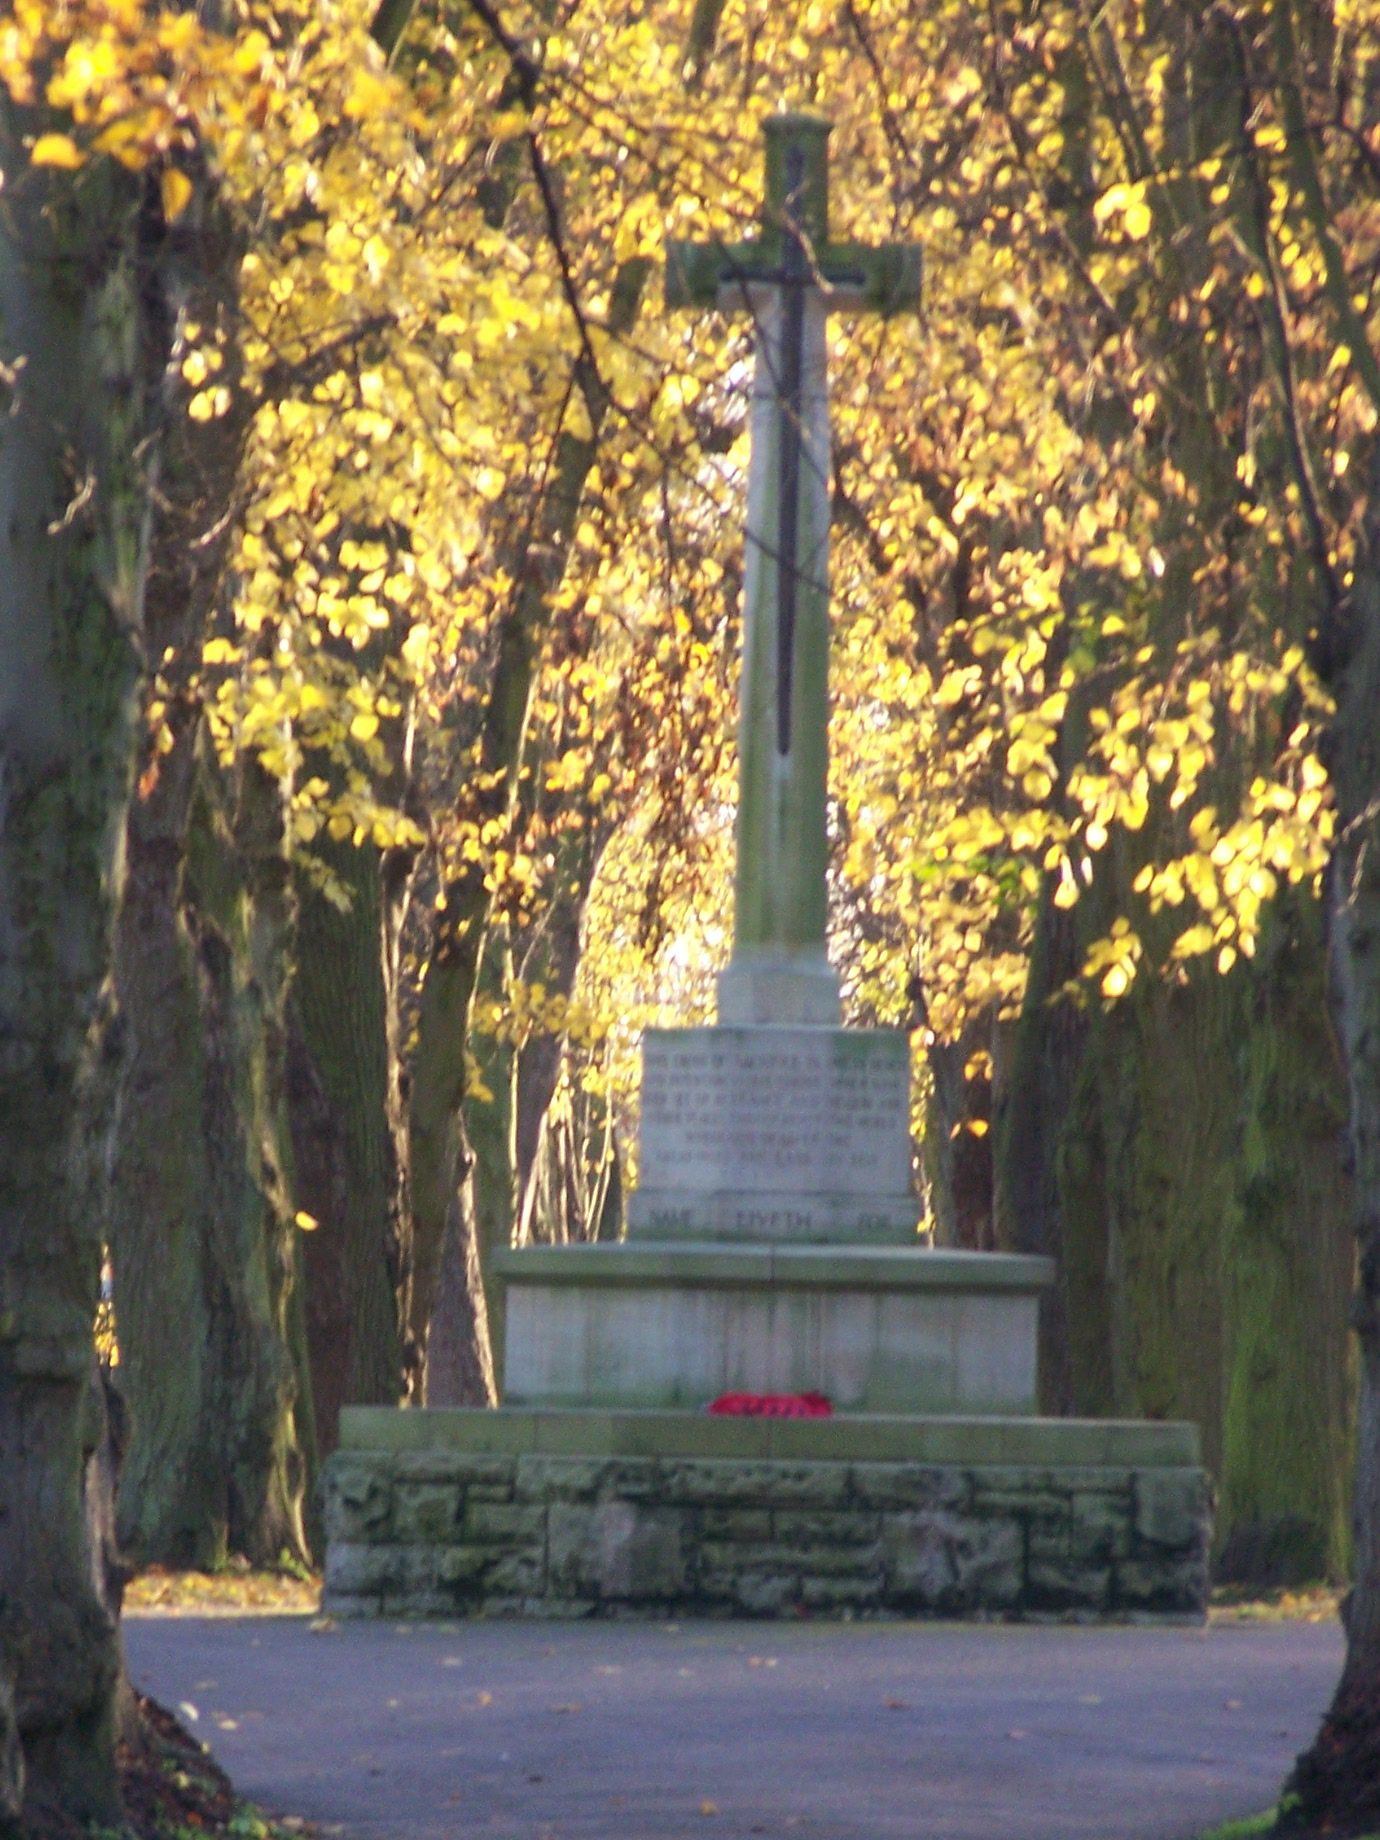 Newark Cemetery War Memorial Newark -On- Trent. Taken by Amateur Photographer Laurencegoff  friendsofnewarkcemetery@yahoo.co.uk 07794613879 http://newarkcemeteryuk.wordpress.com/